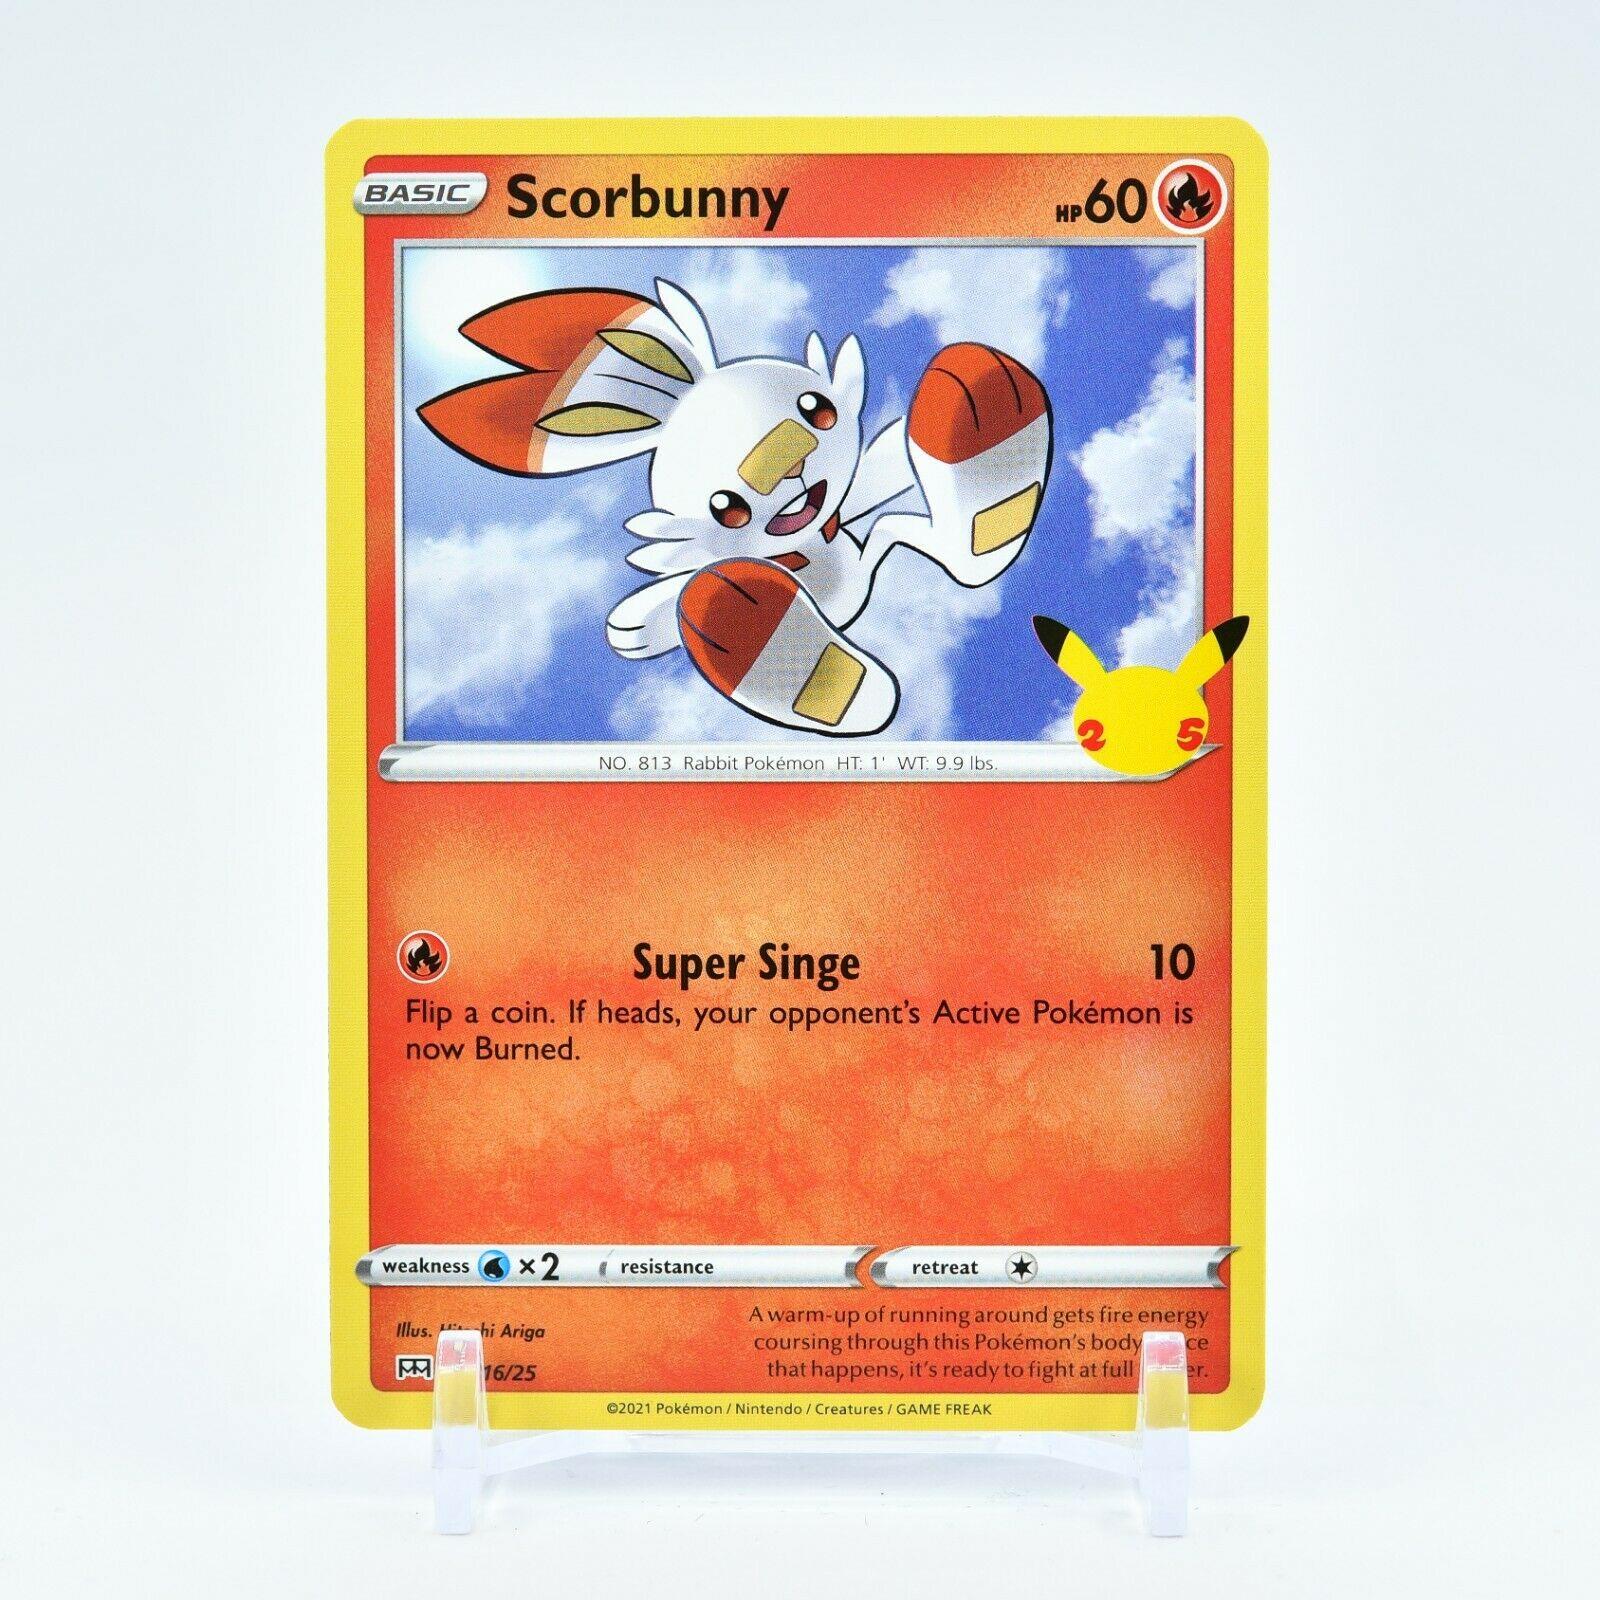 Scorbunny - 16/25 Mcdonald's Promo 25th Anniversary Starter Pokemon - NM/MINT